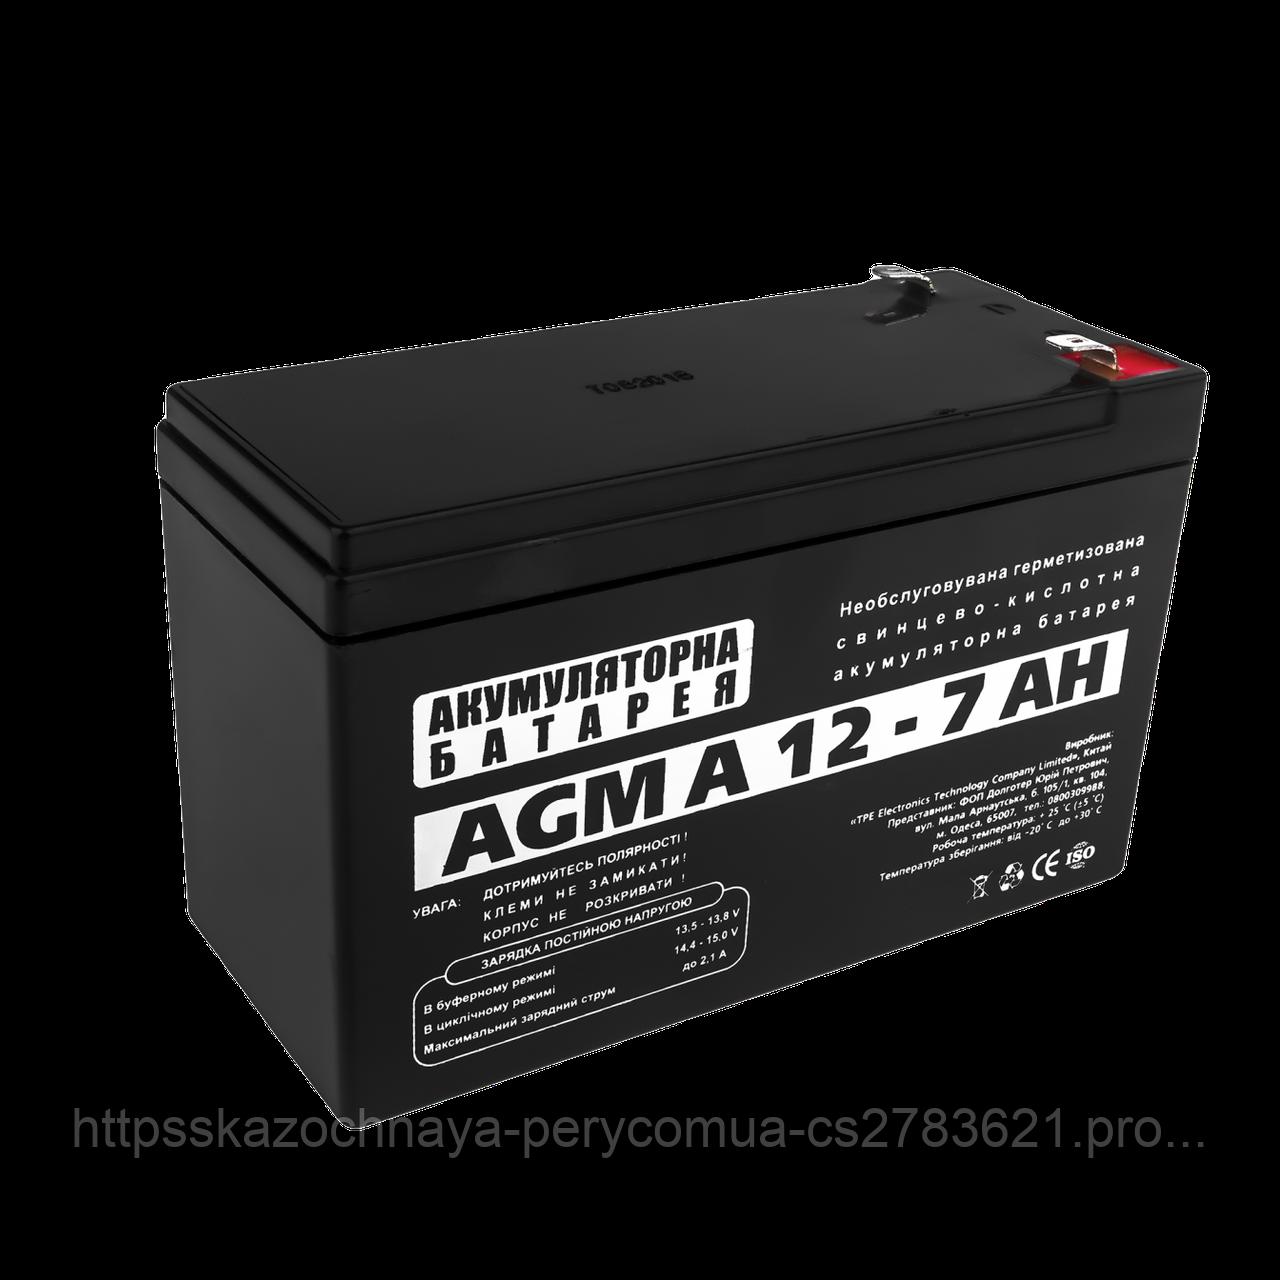 Кислотна акумуляторна батарея AGM LogicPower А 12 - 7 AH